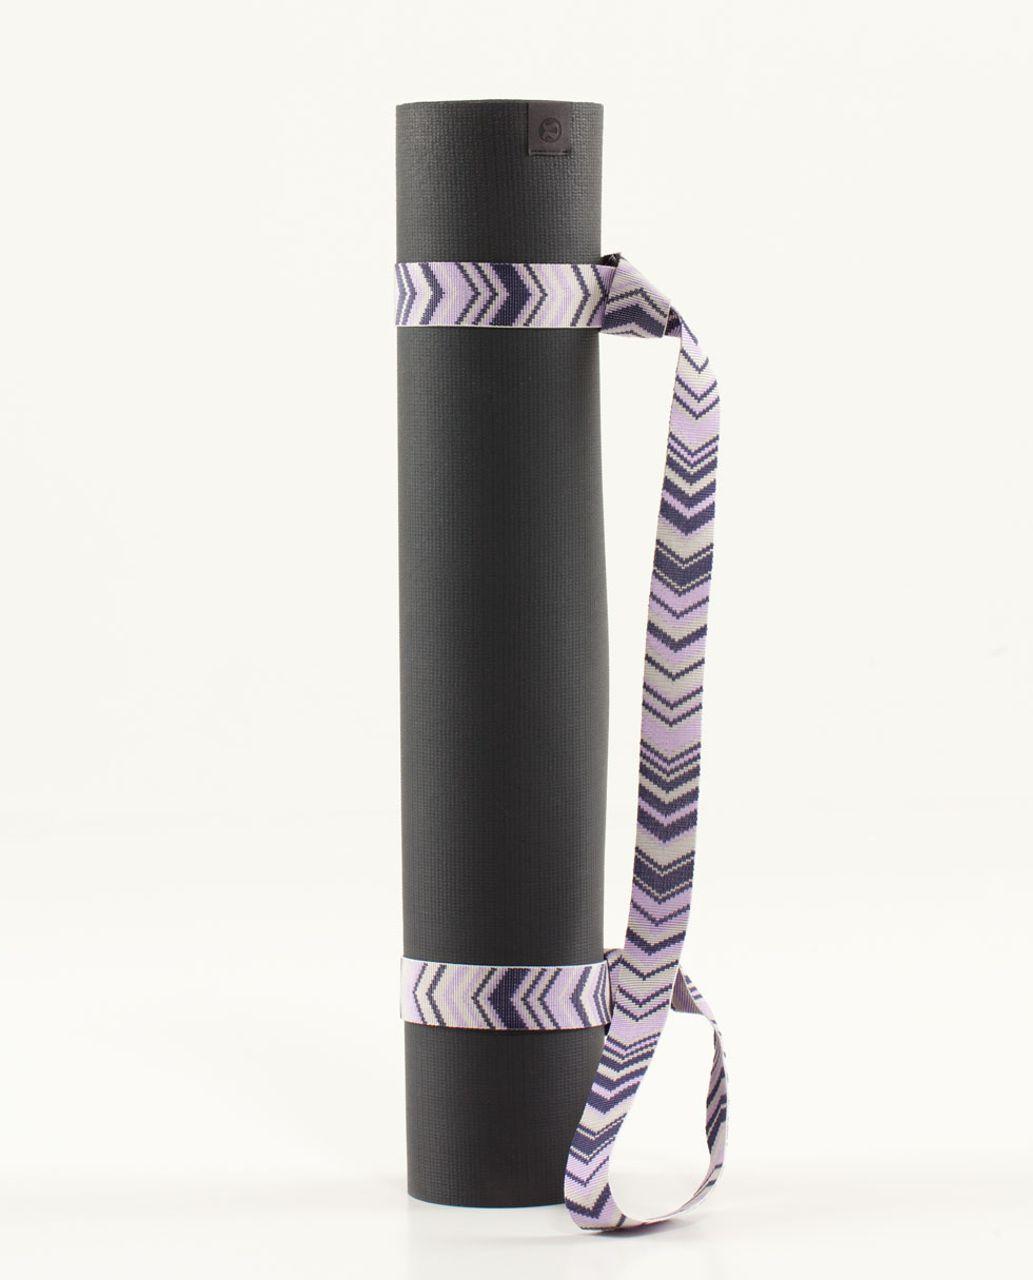 Lululemon Loop It Up Mat Strap - Groovy Grape